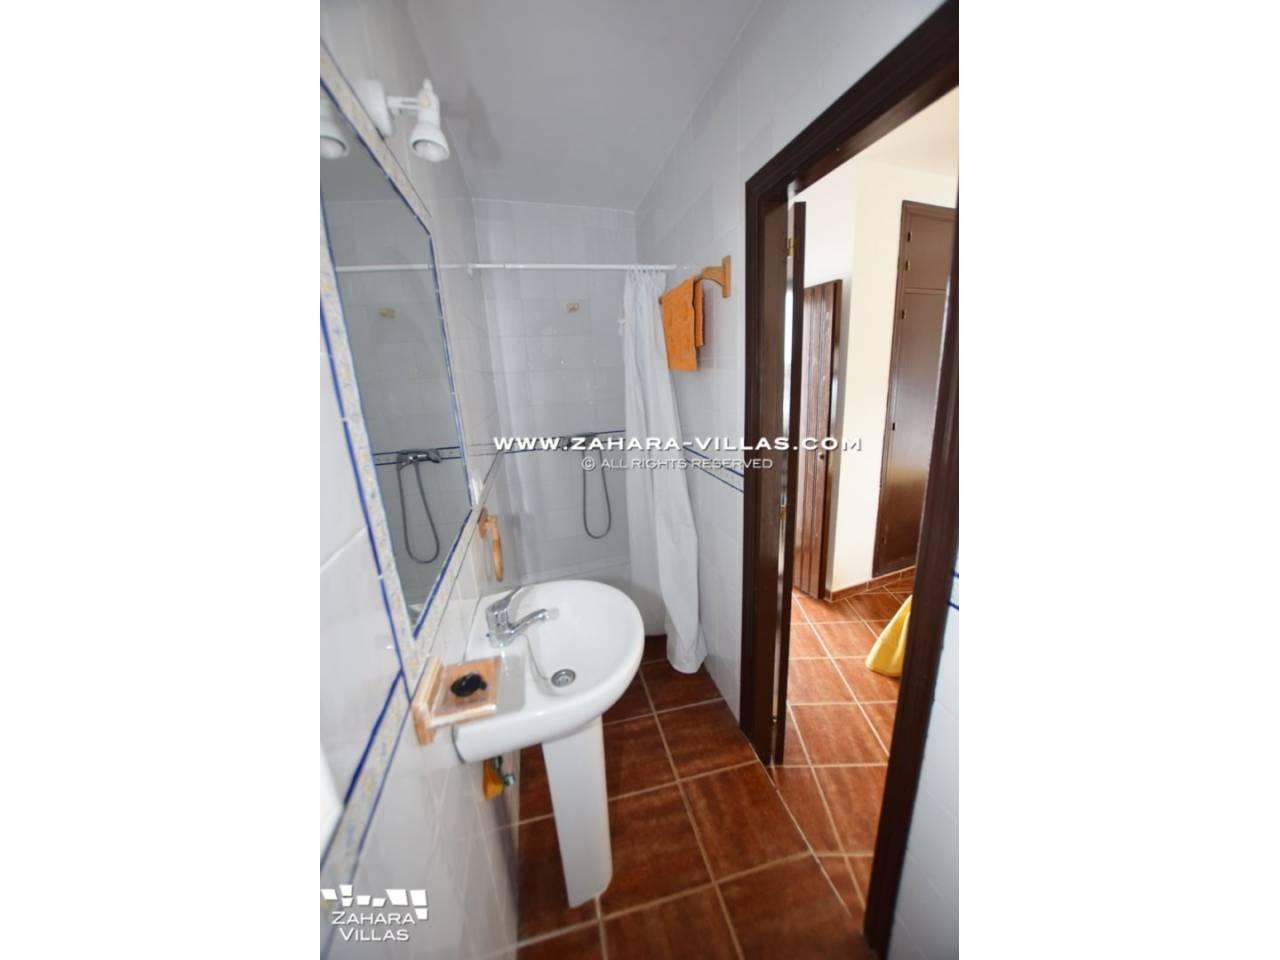 Imagen 8 de House, Apartment and Plot to build in the historic center of Vejer de la Frontera